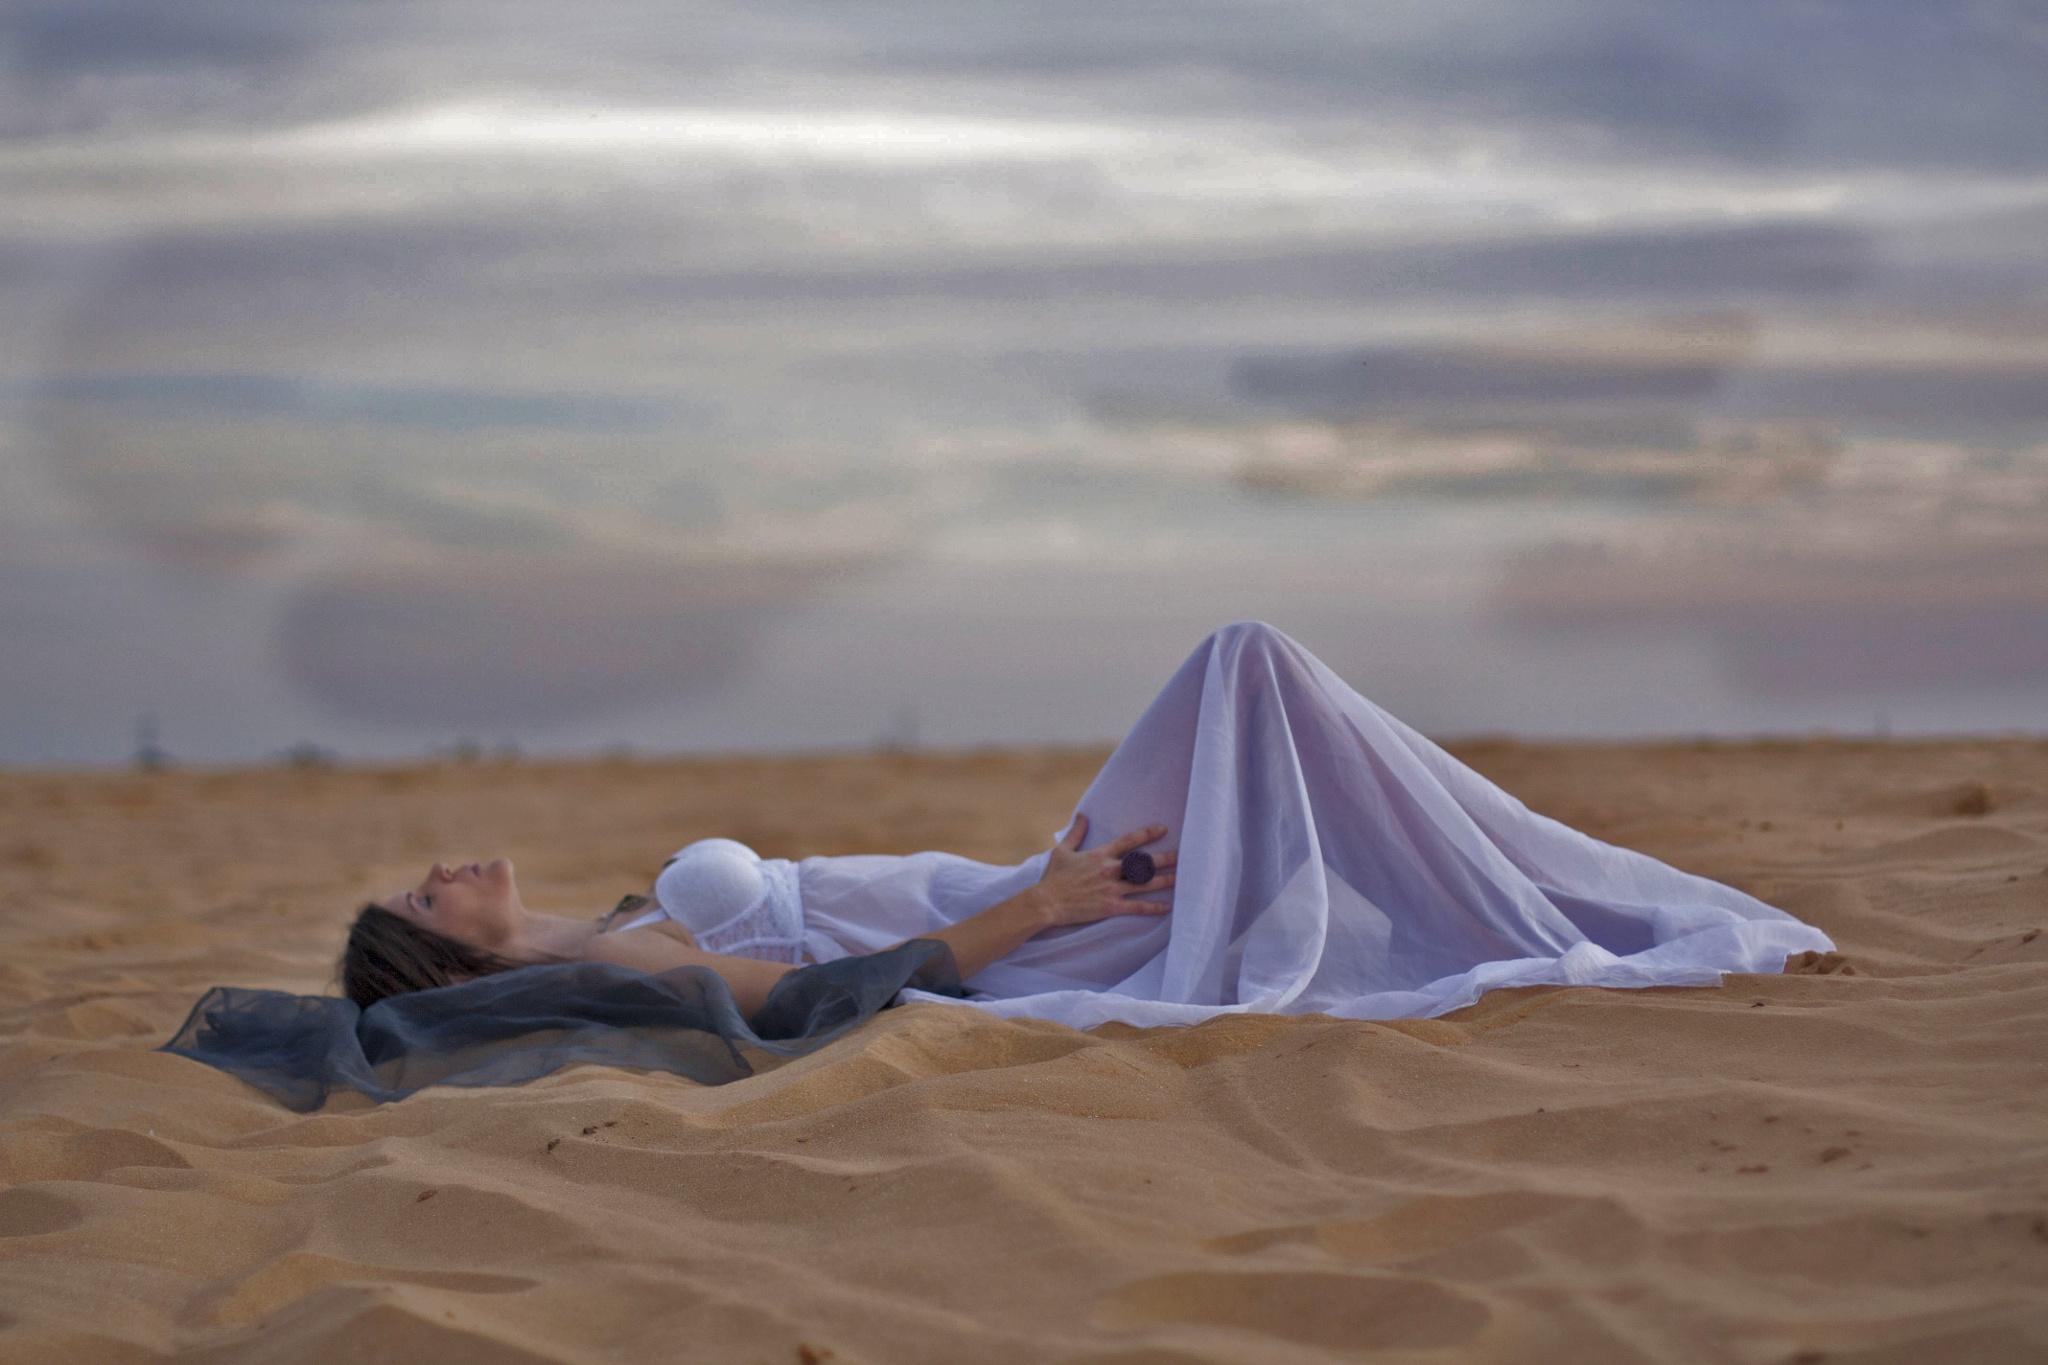 Untitled by Yoni Safri